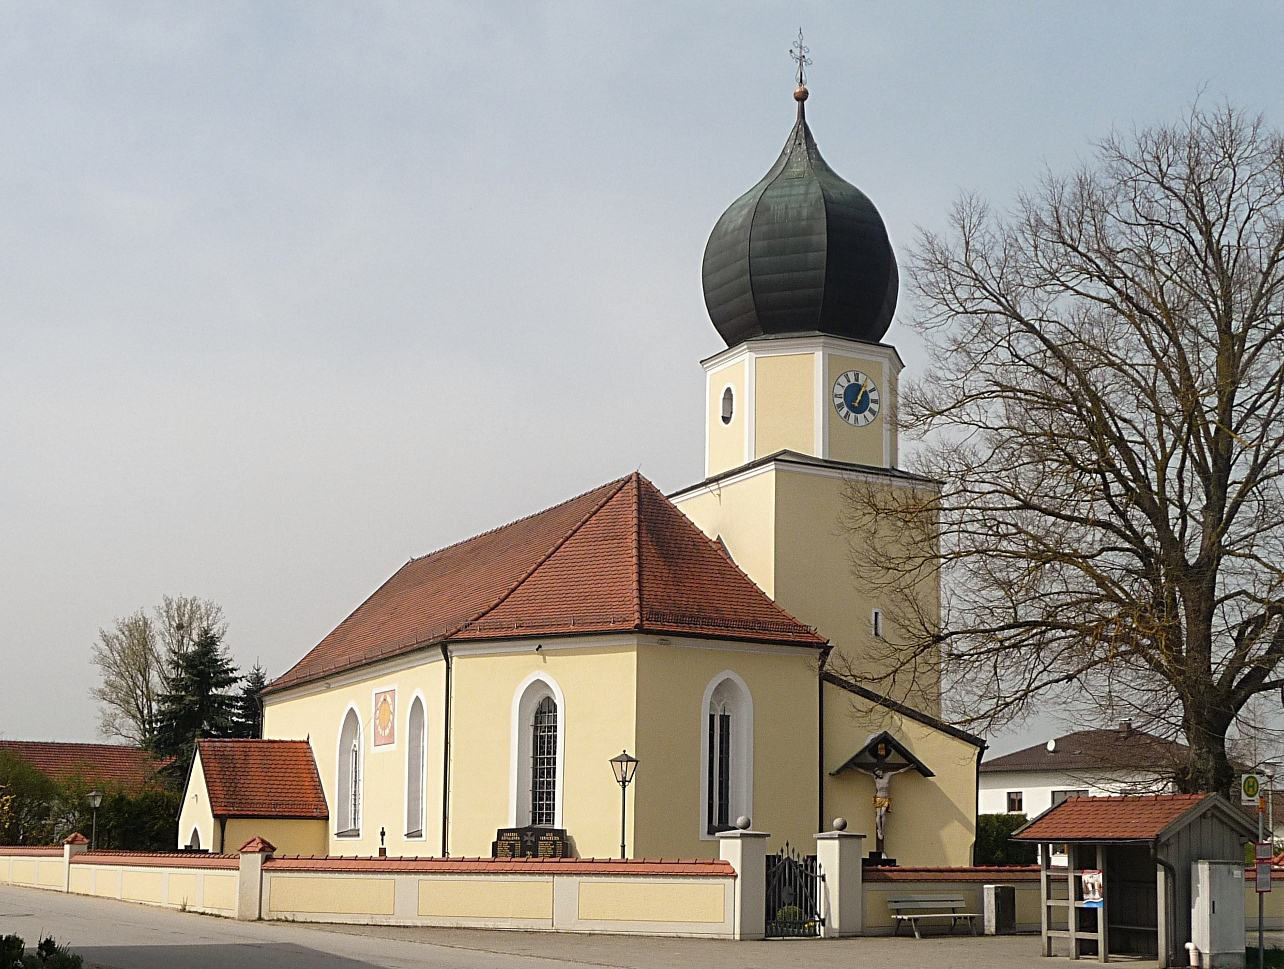 St Michael Arbing